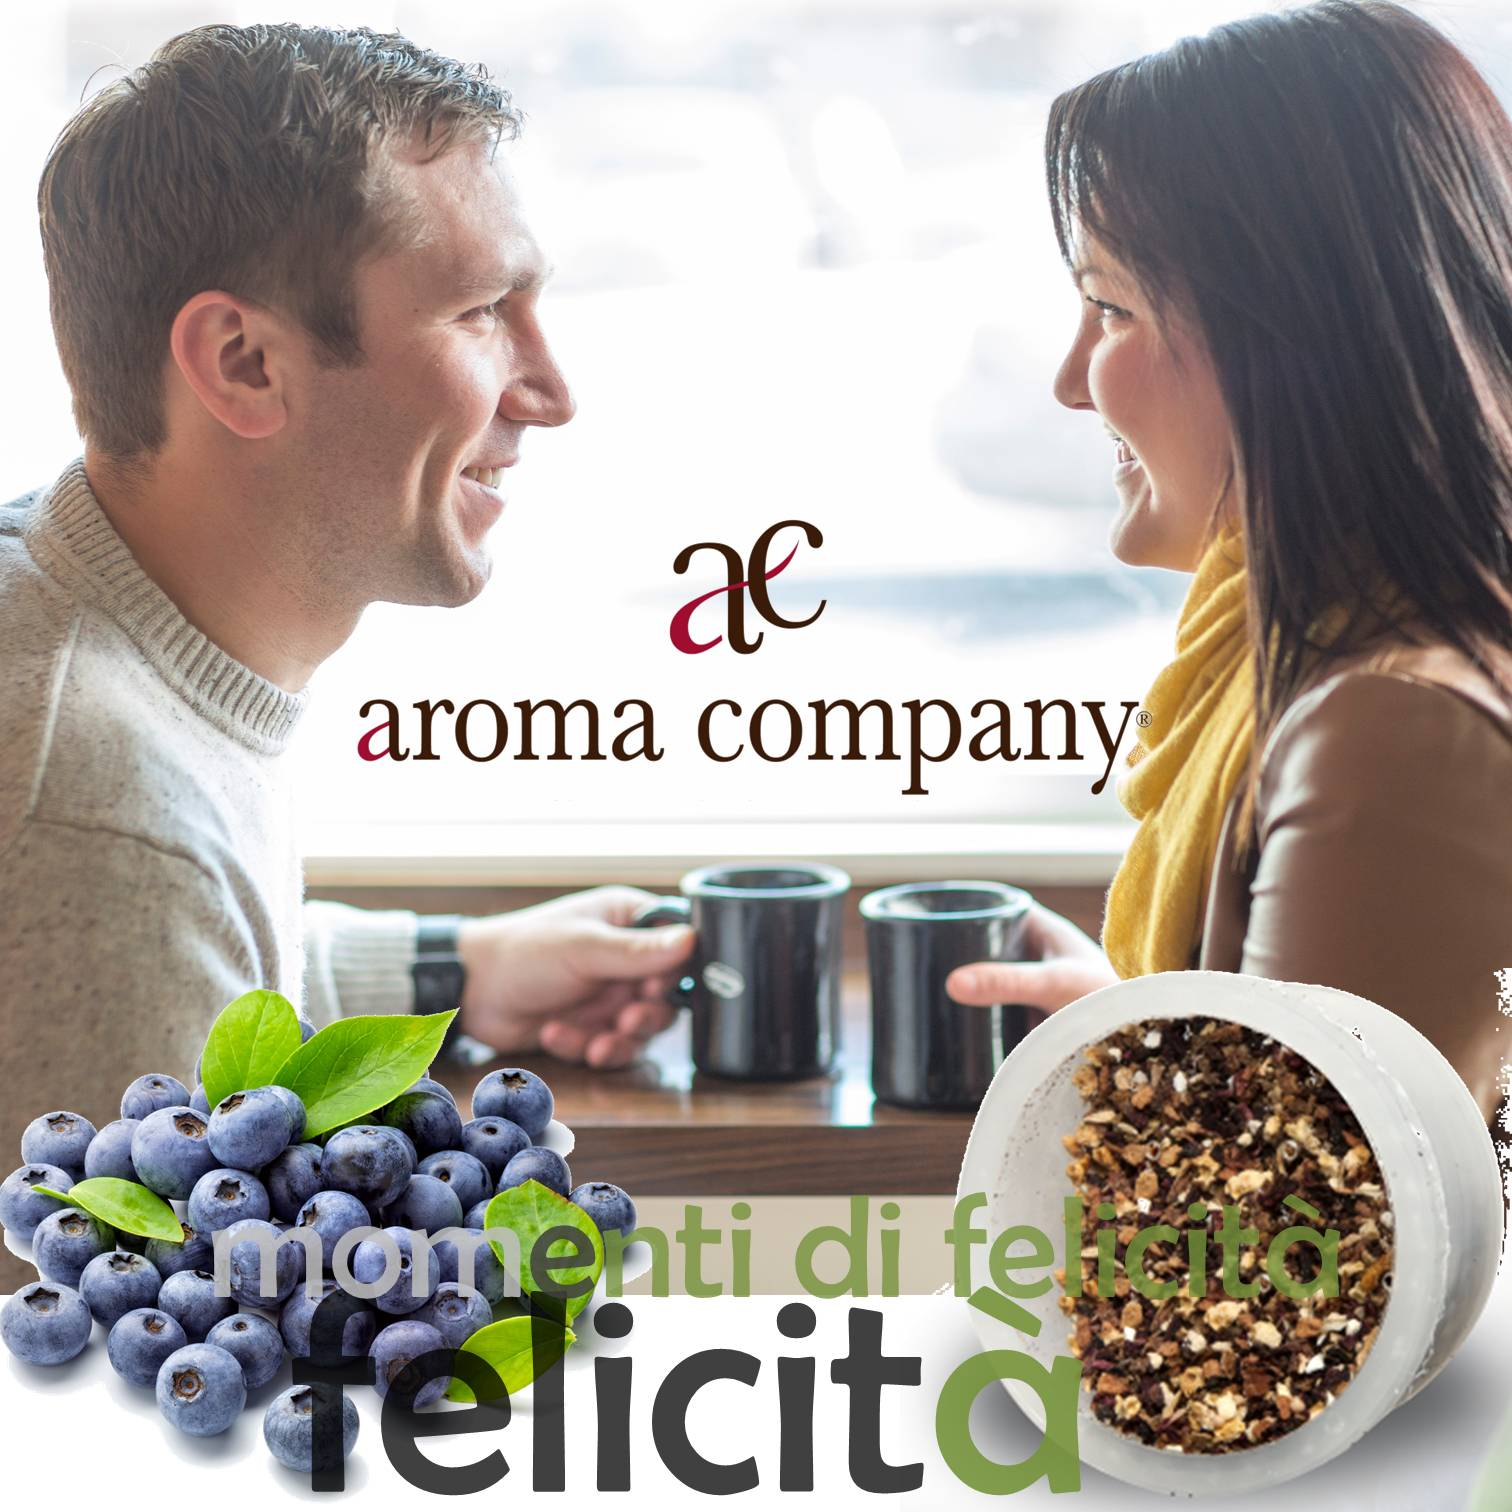 Heidelbeer-Kräutertee Punkt Espresso Kapseln kompatibel Aroma Company Glück zusammen